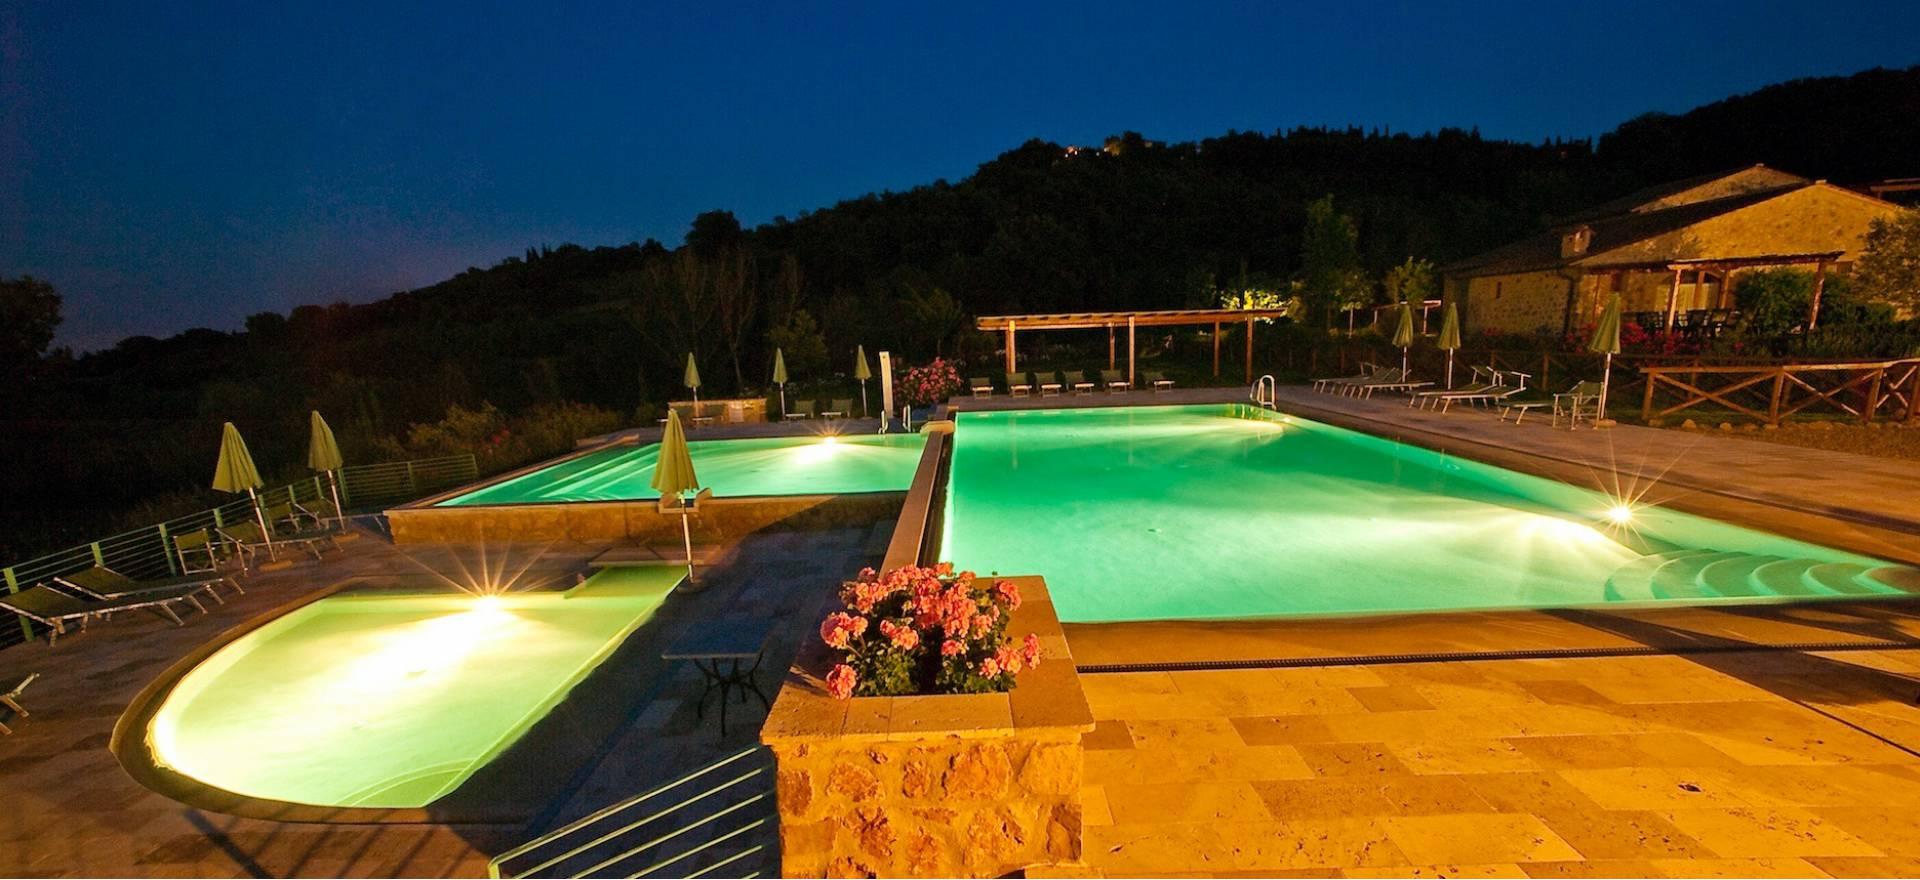 Agriturismo Toskana Agriturismo Country Resort Toskana mit Restaurant und Pool